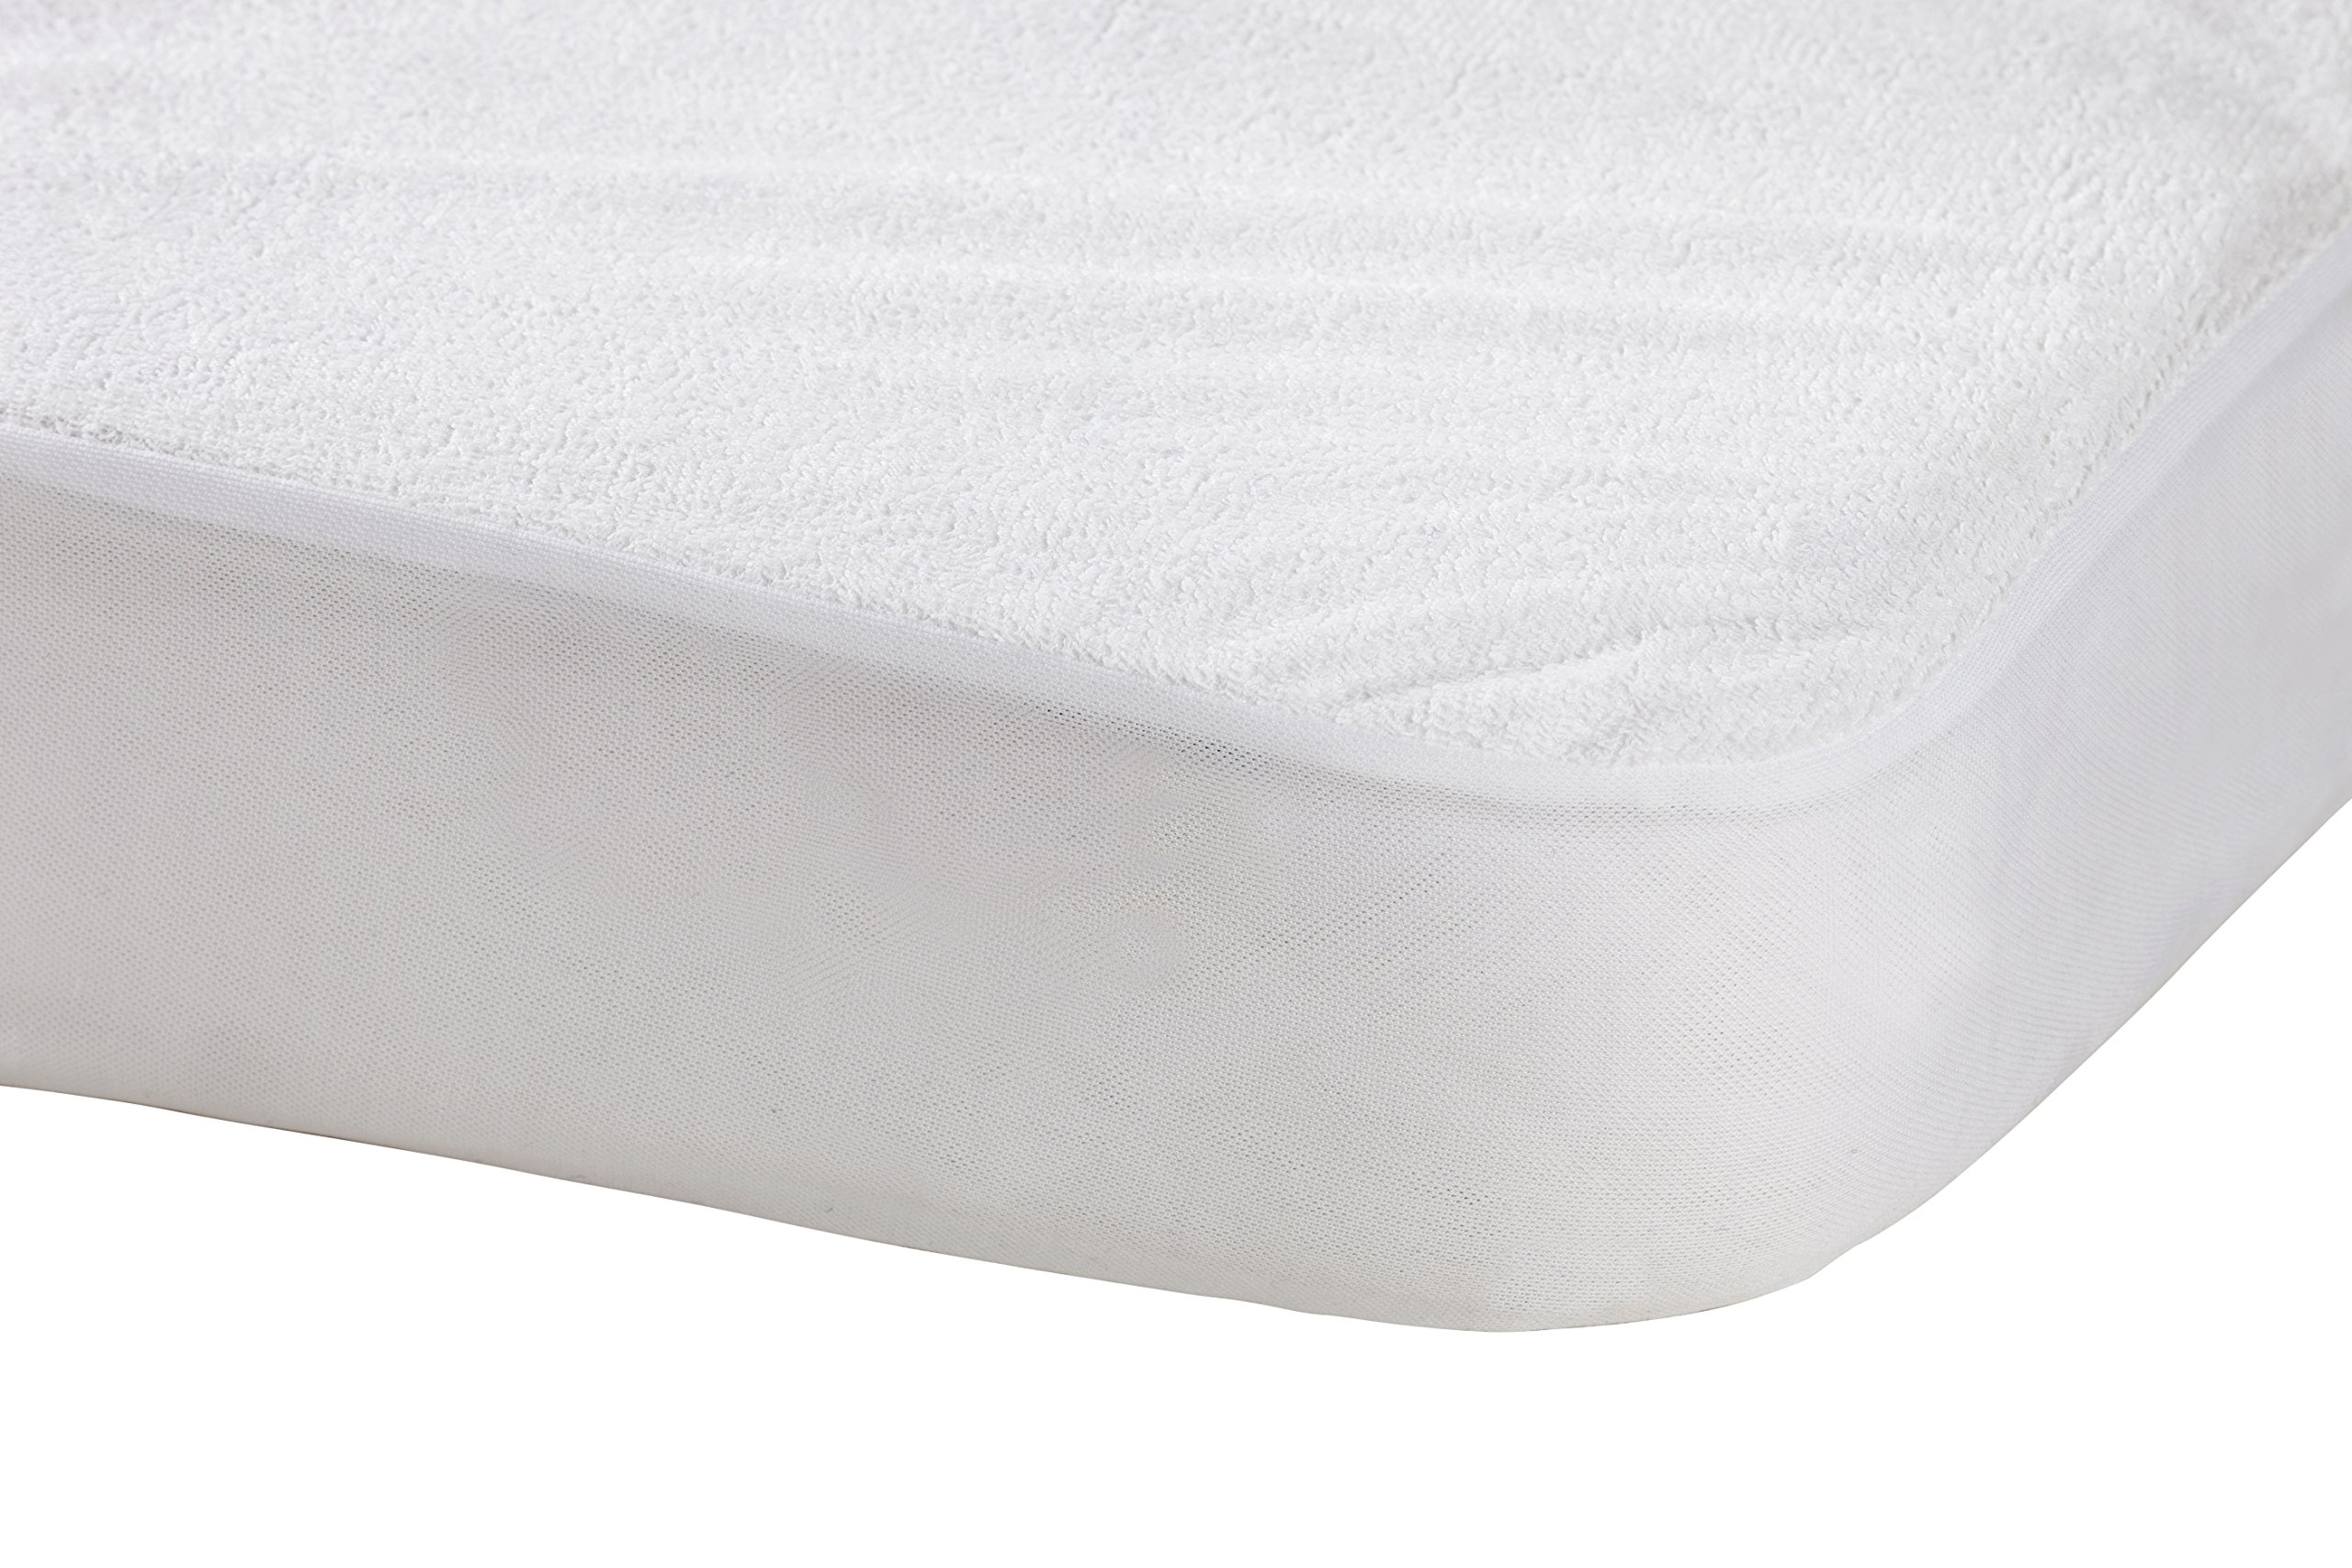 Playgro Bonne Santé Crib Mattress Protector Cotton Terry by Playgro